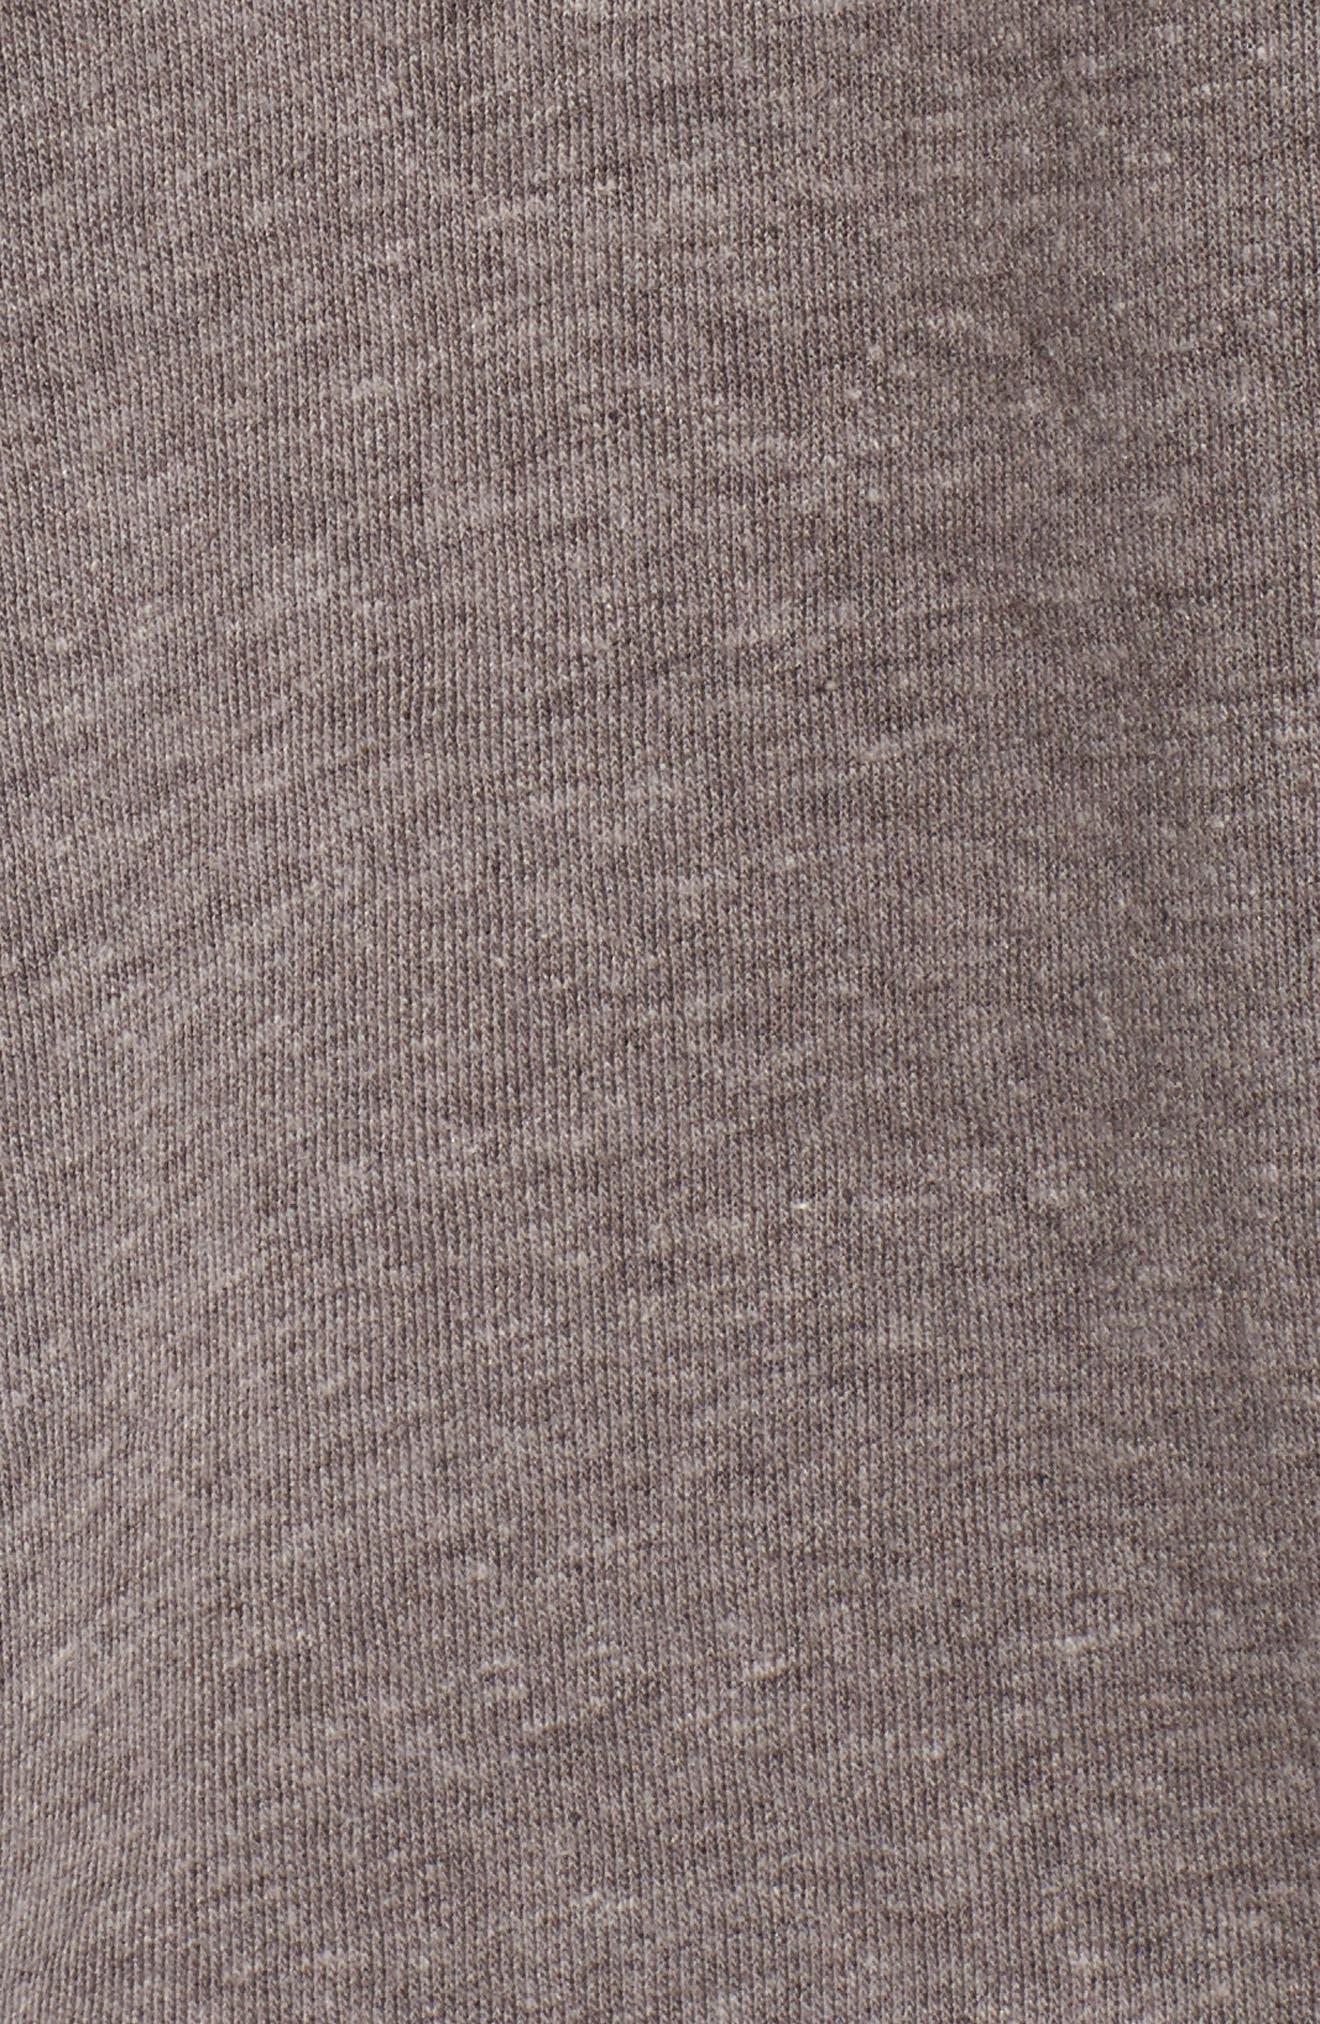 Golden Girls Willow Sweatshirt,                             Alternate thumbnail 6, color,                             Heather Grey